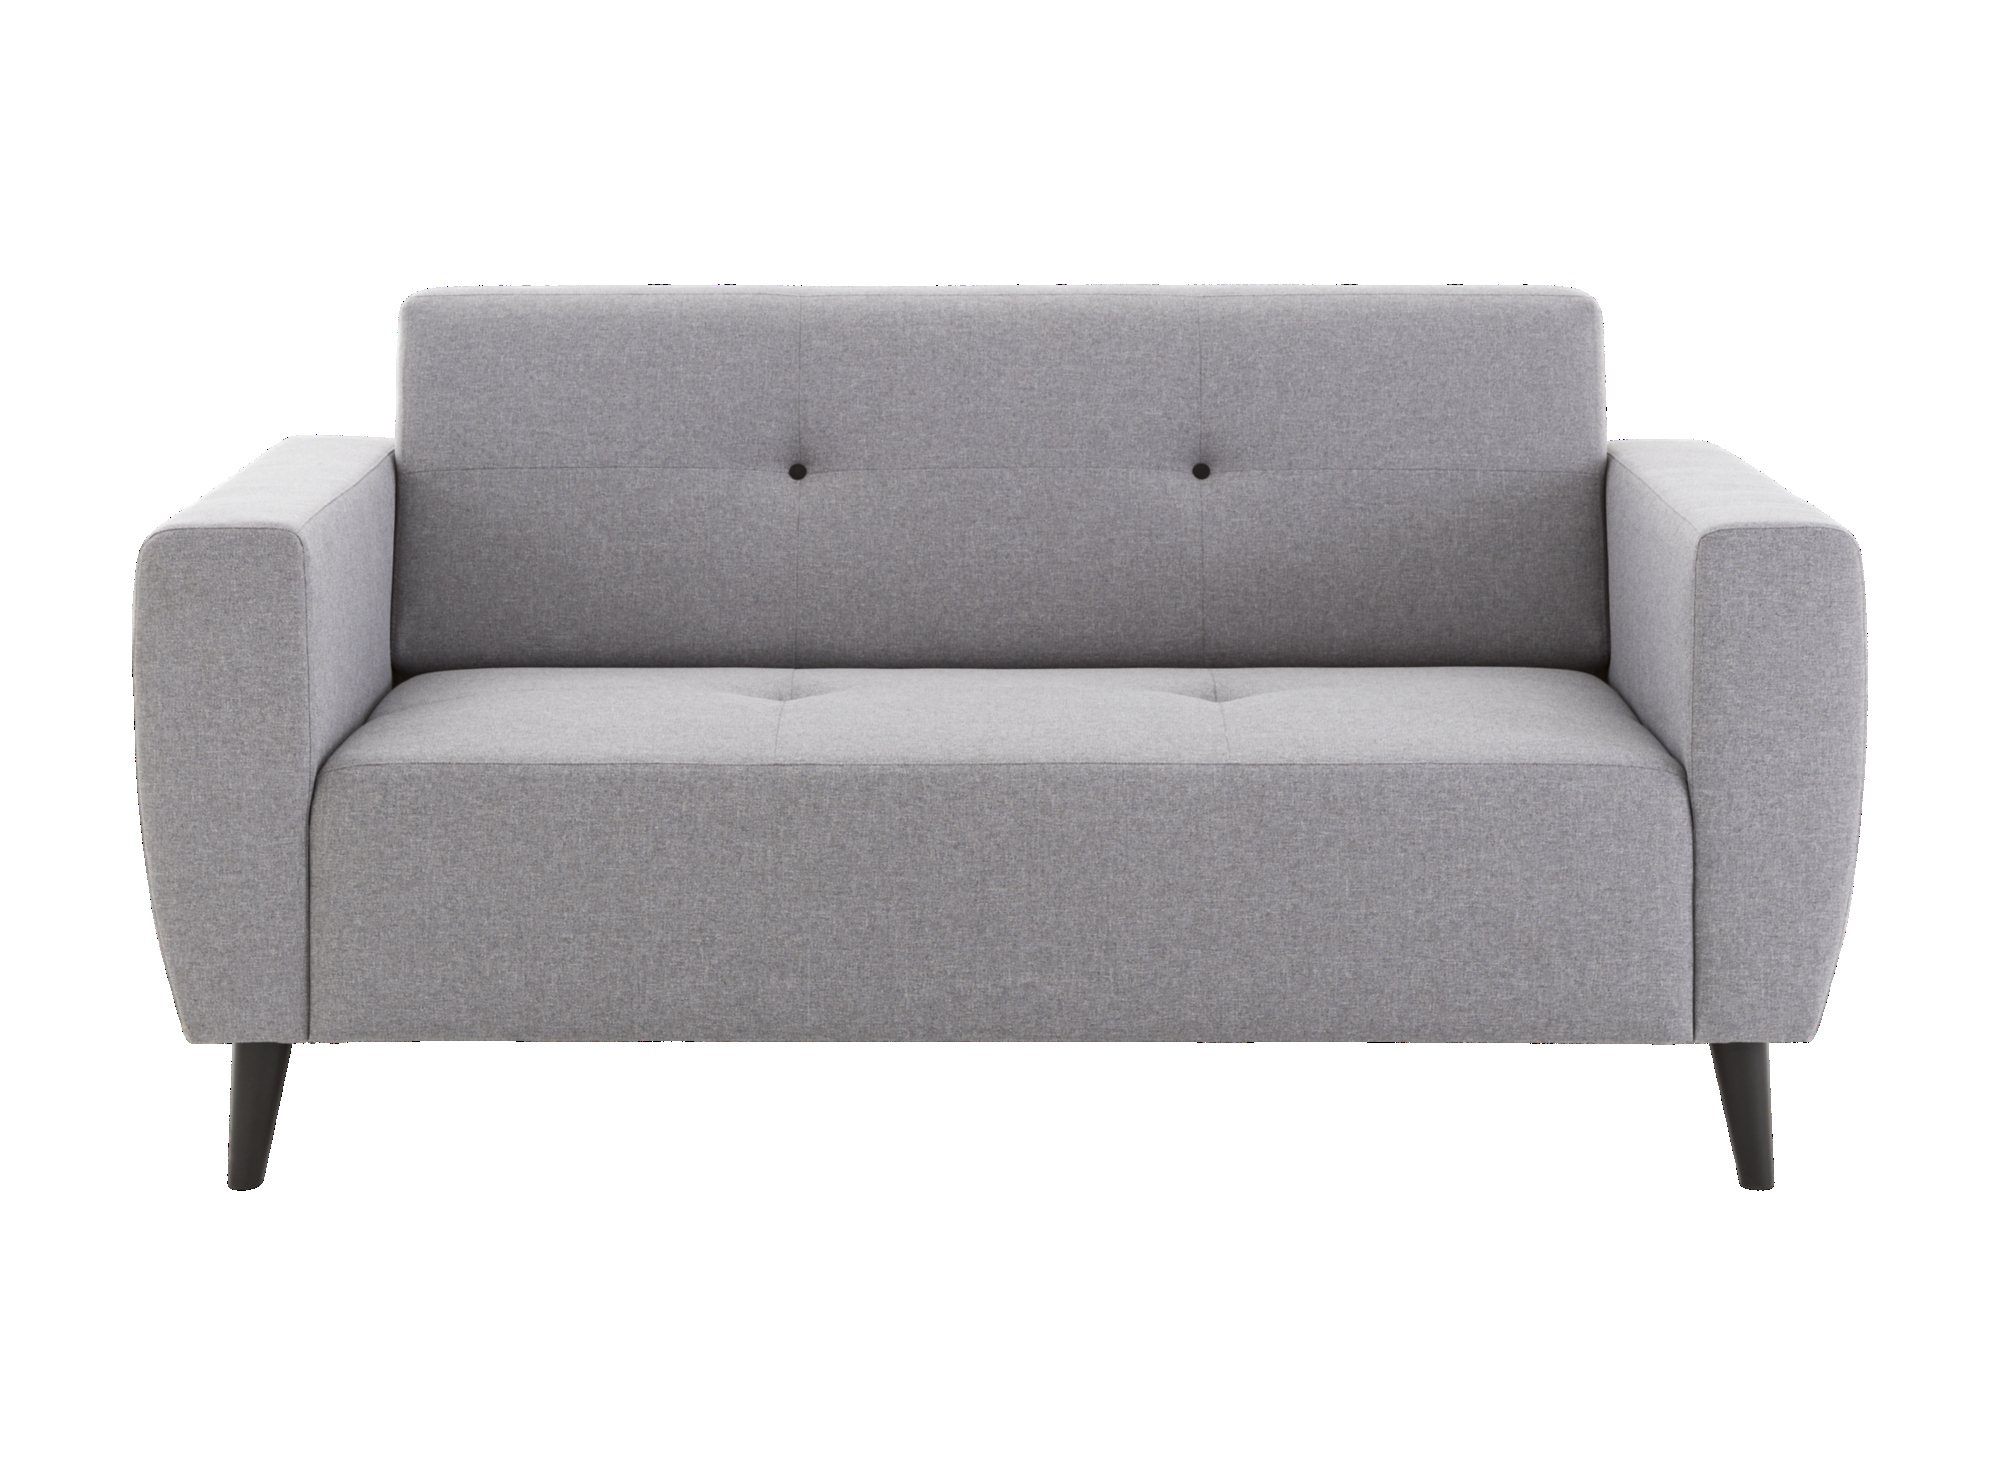 Home Spirit Destockage Luxe Image Canapé En Lin Blanc Fashion Designs